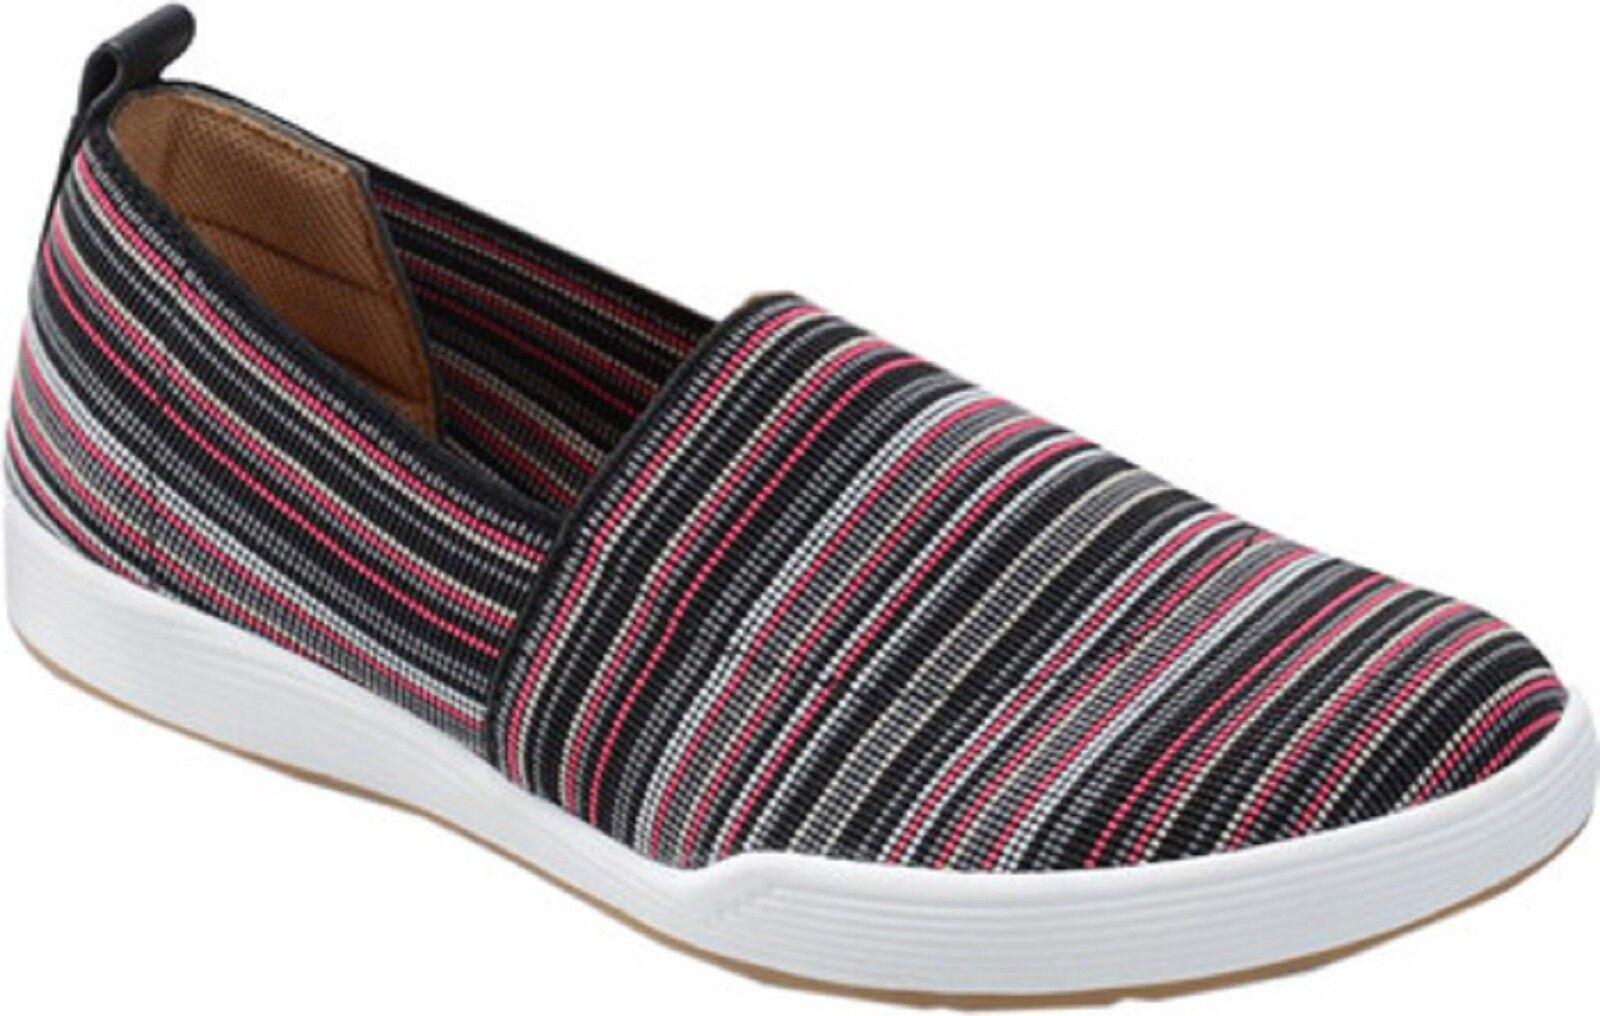 design unico COMFORTIVA Ladies LIDA Slip-On Slip-On Slip-On Stretch Textile scarpe nero MULTI Sz. 9.5 M  NIB  alta qualità